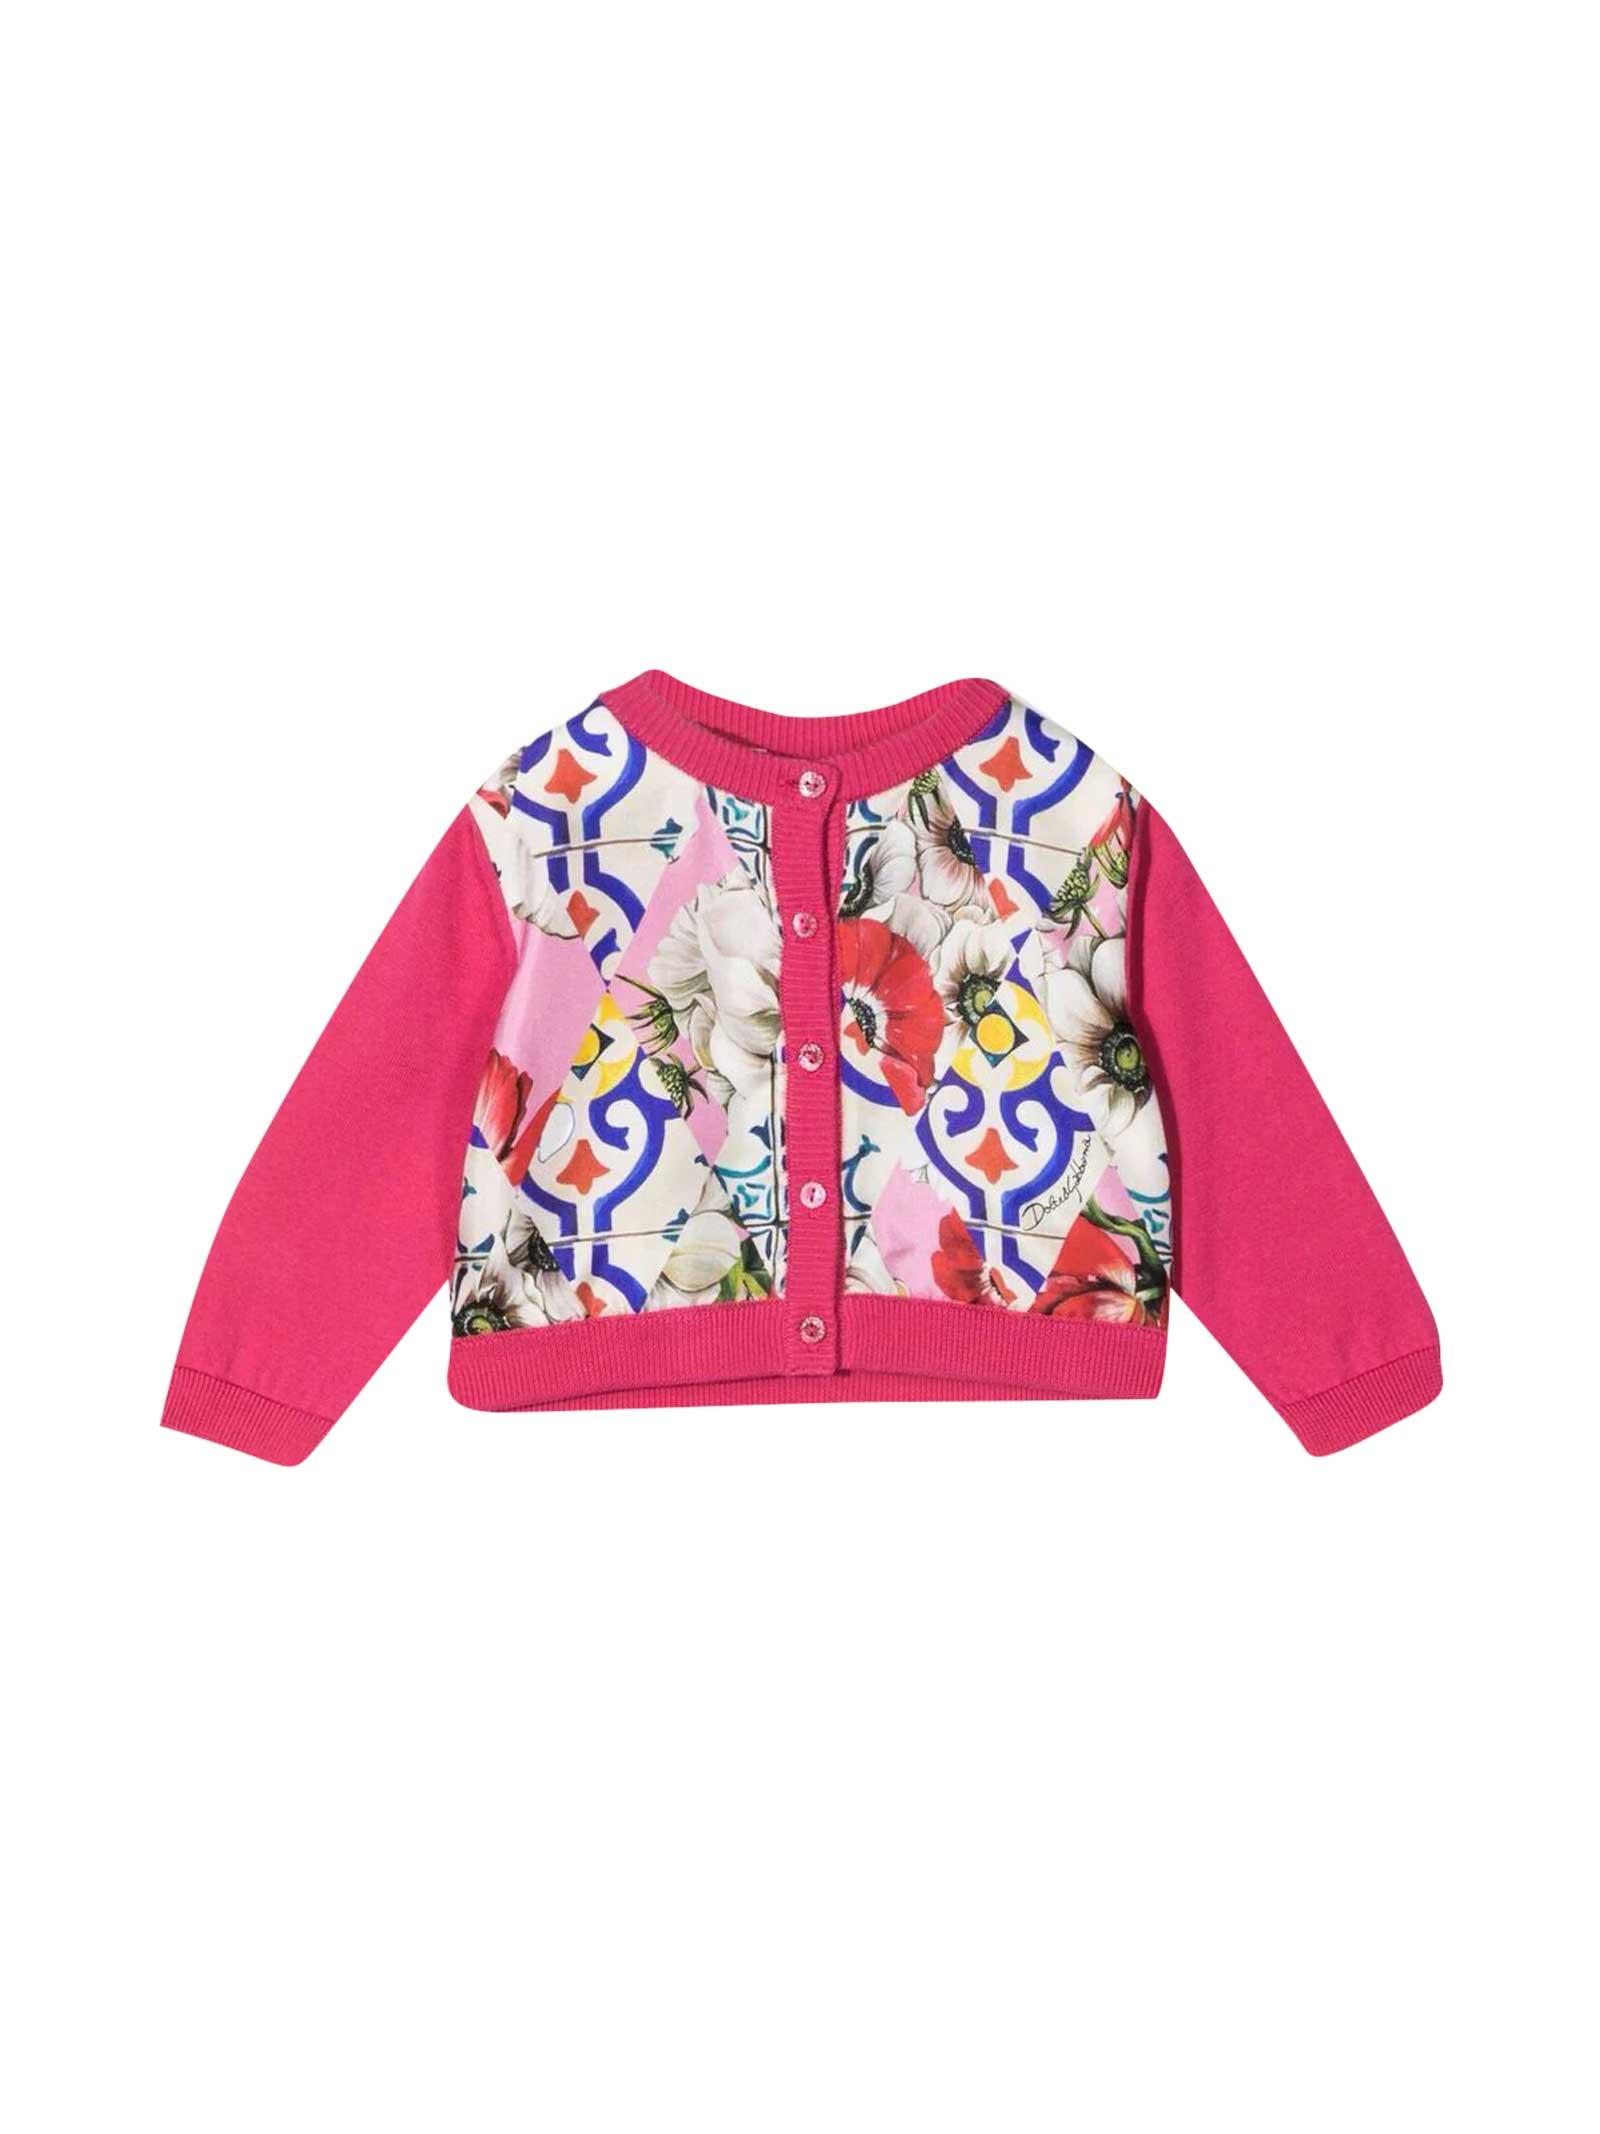 Dolce & Gabbana Cottons FUCHSIA CARDIGAN